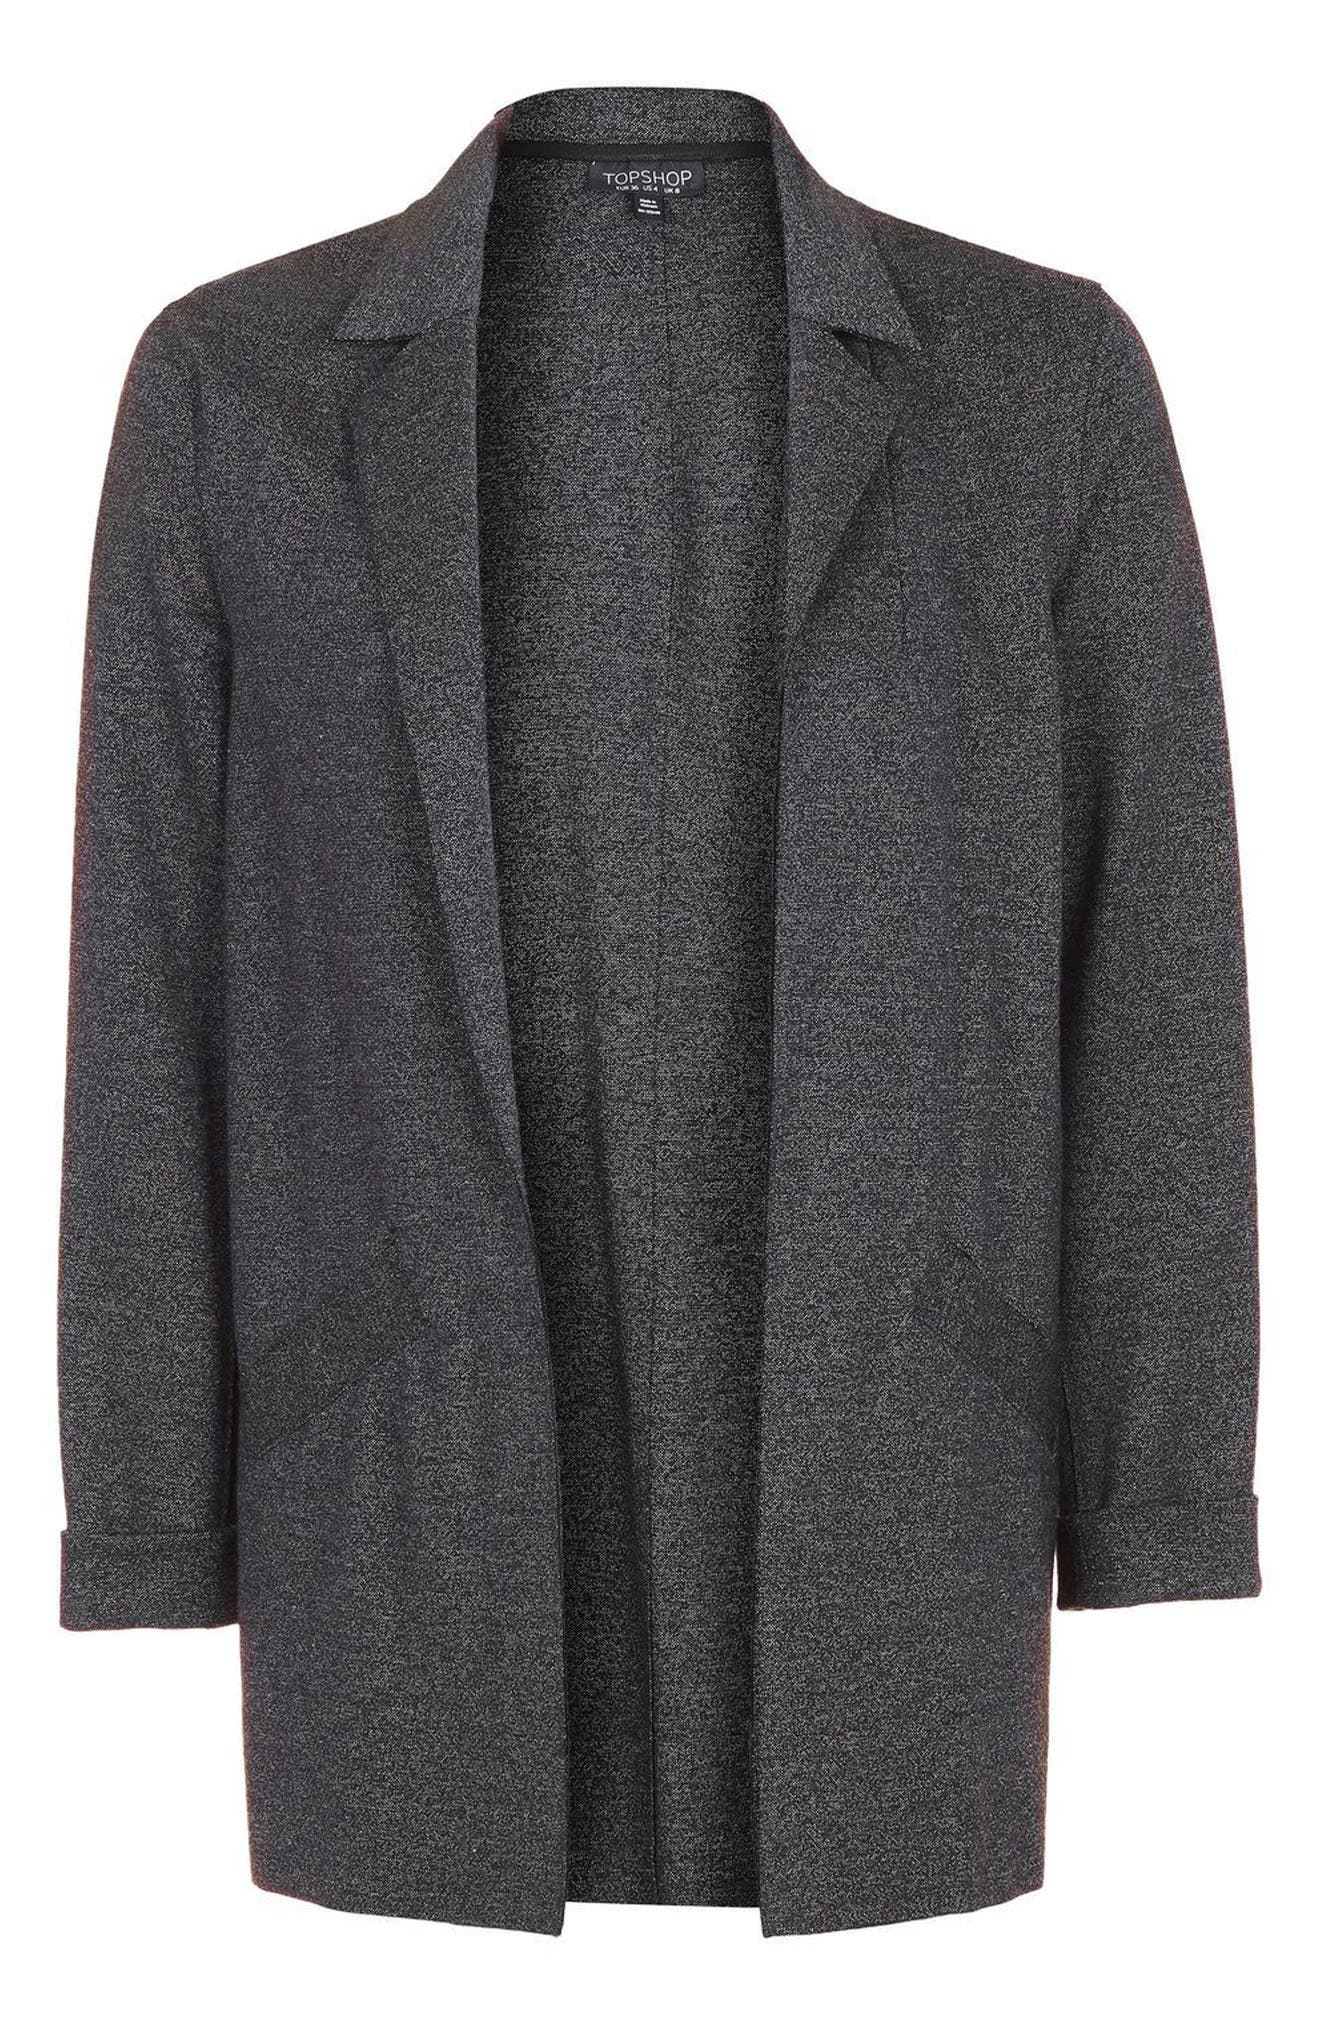 Alternate Image 1 Selected - Topshop Open Front Blazer